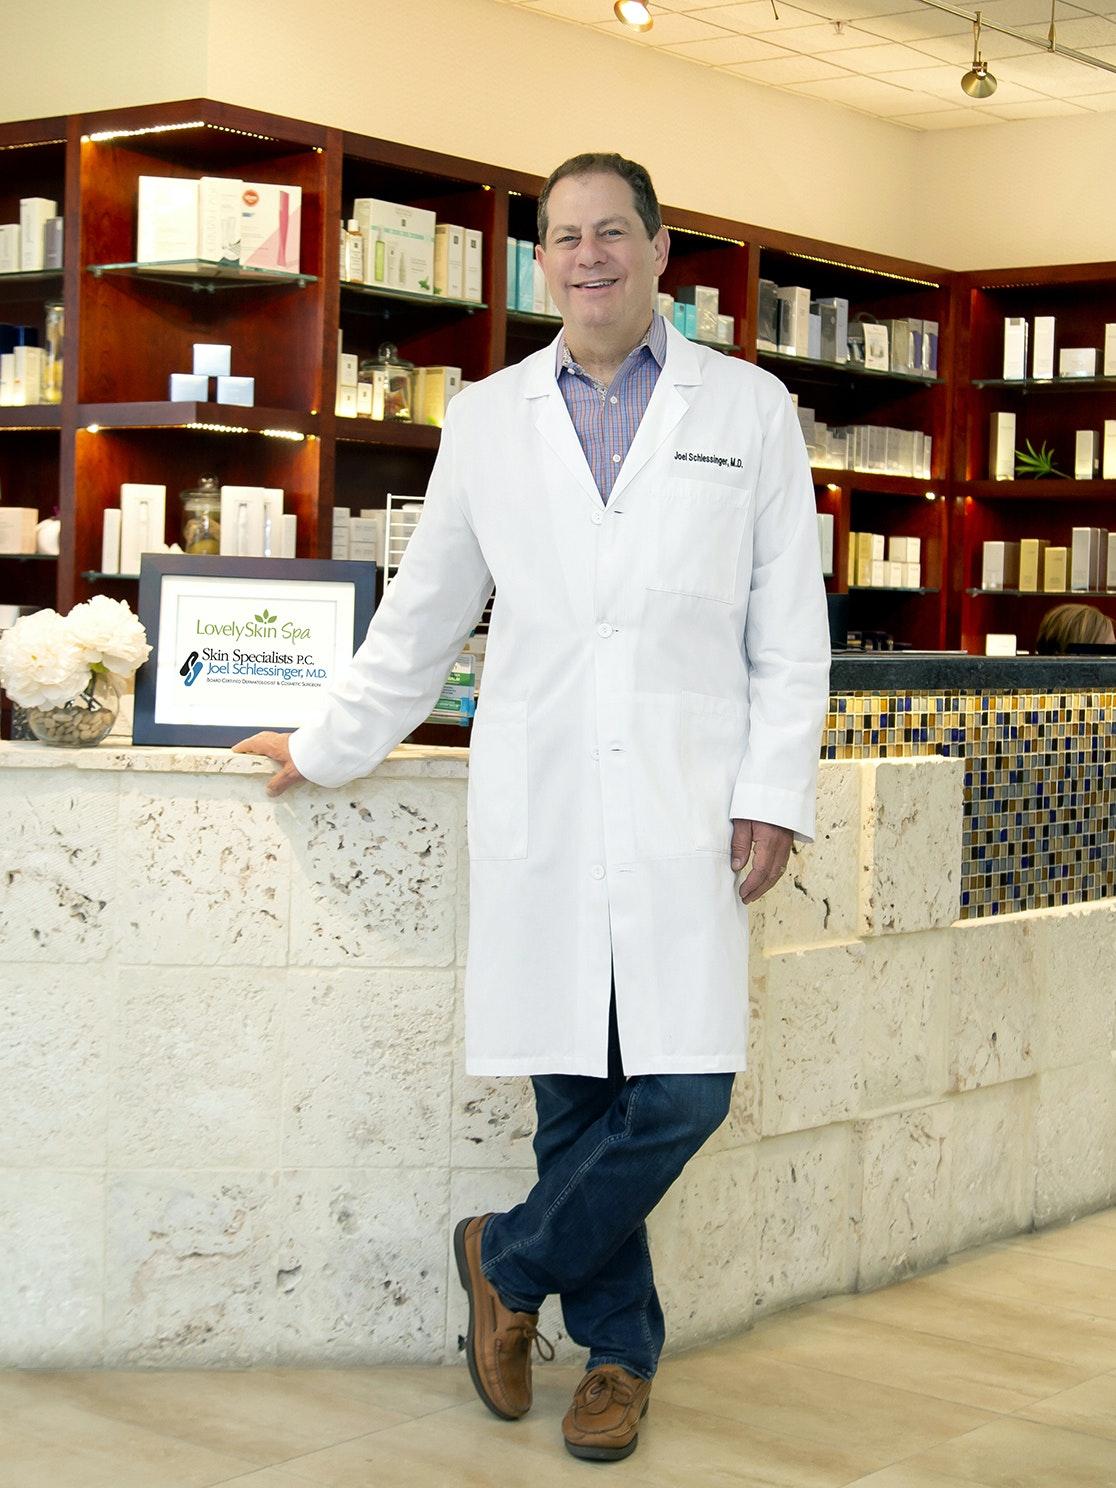 Dr. Schlessinger